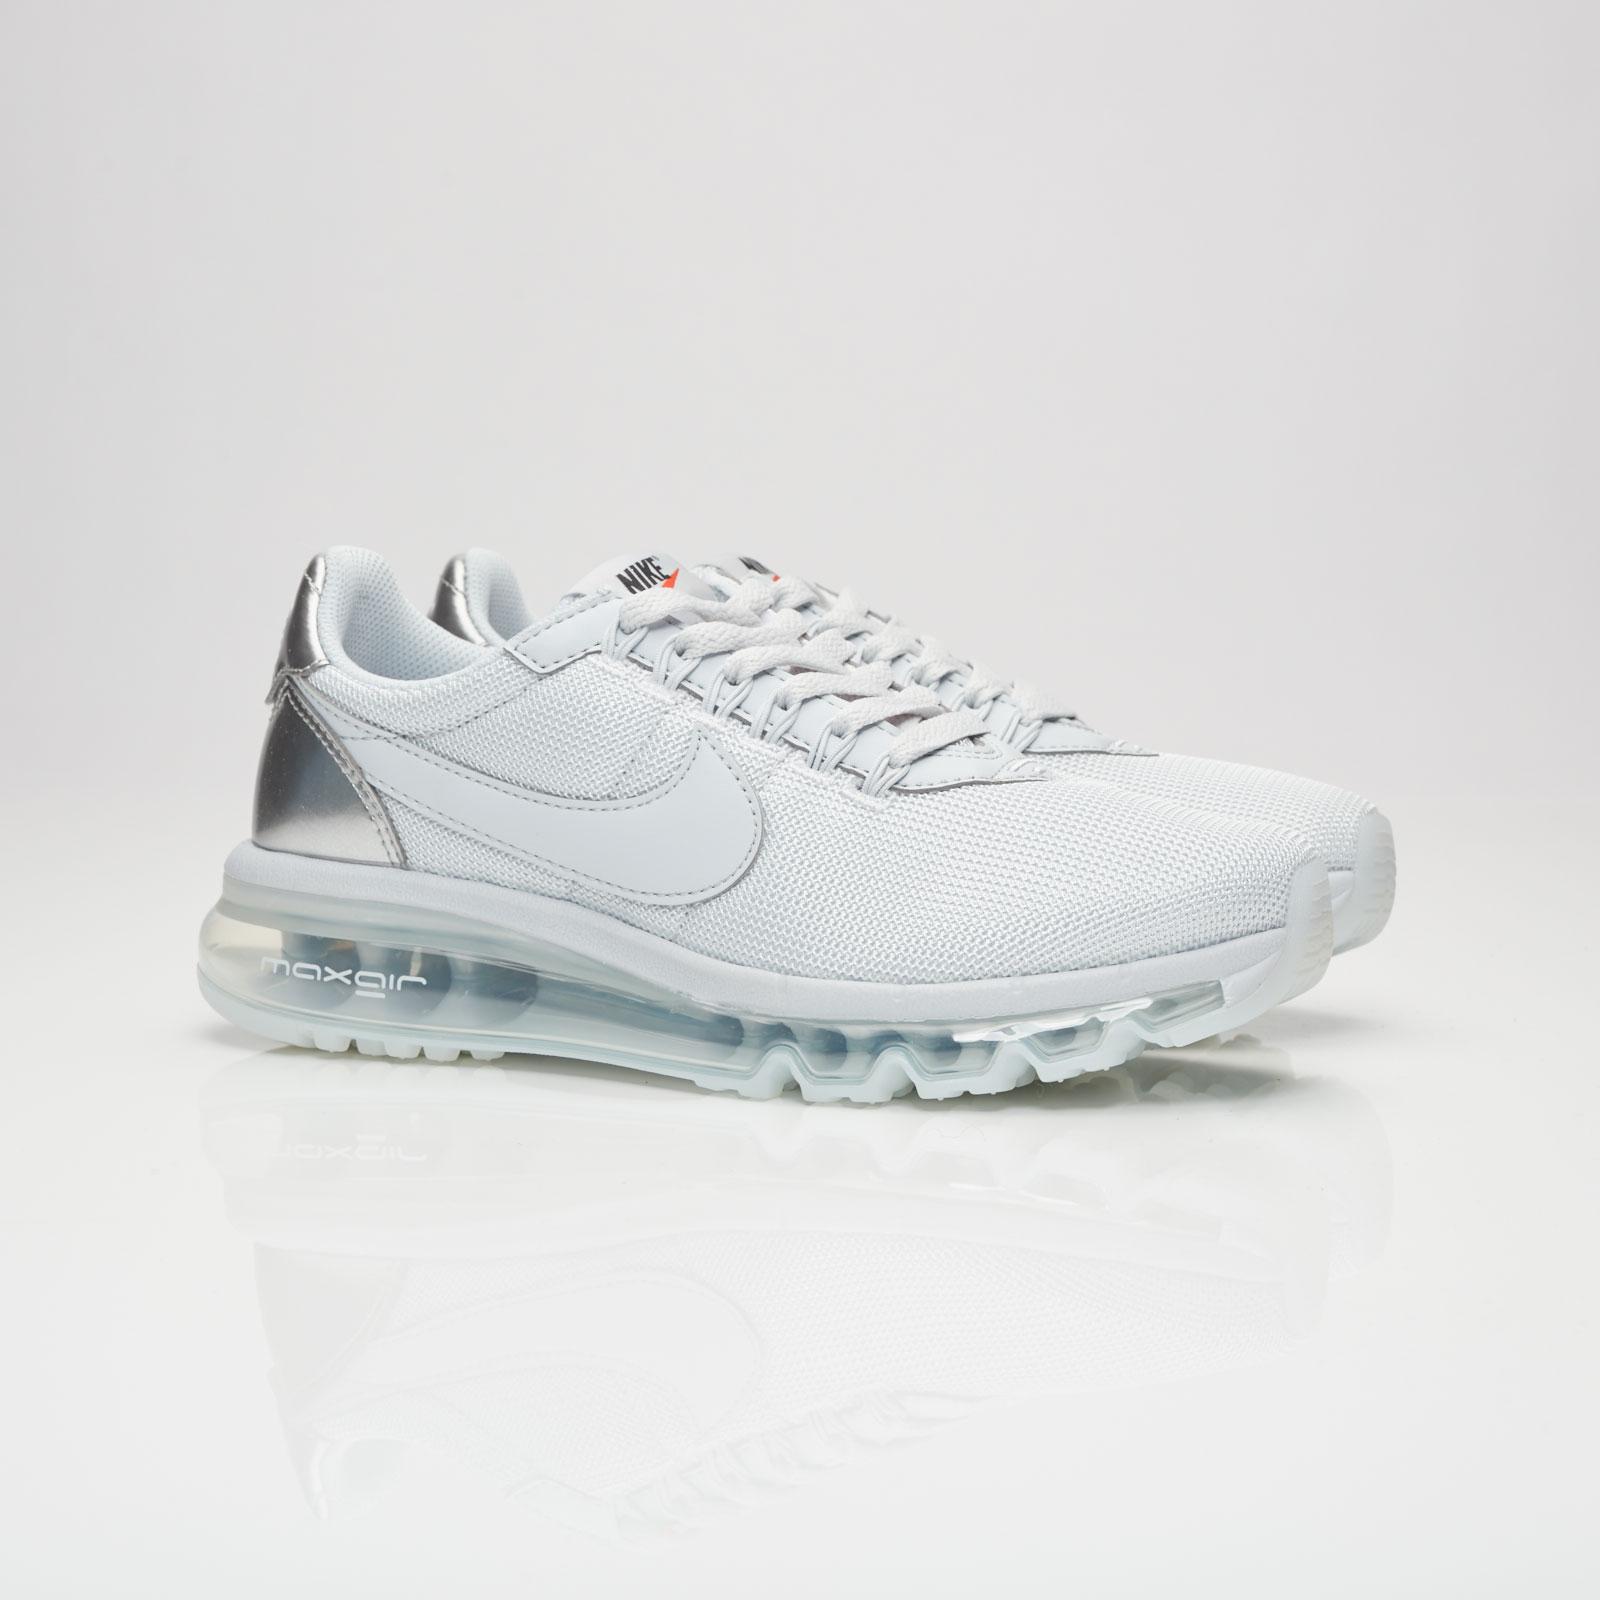 premium selection 34fa4 80a70 Nike Wmns Air Max Ld-Zero - 911180-002 - Sneakersnstuff   sneakers ...